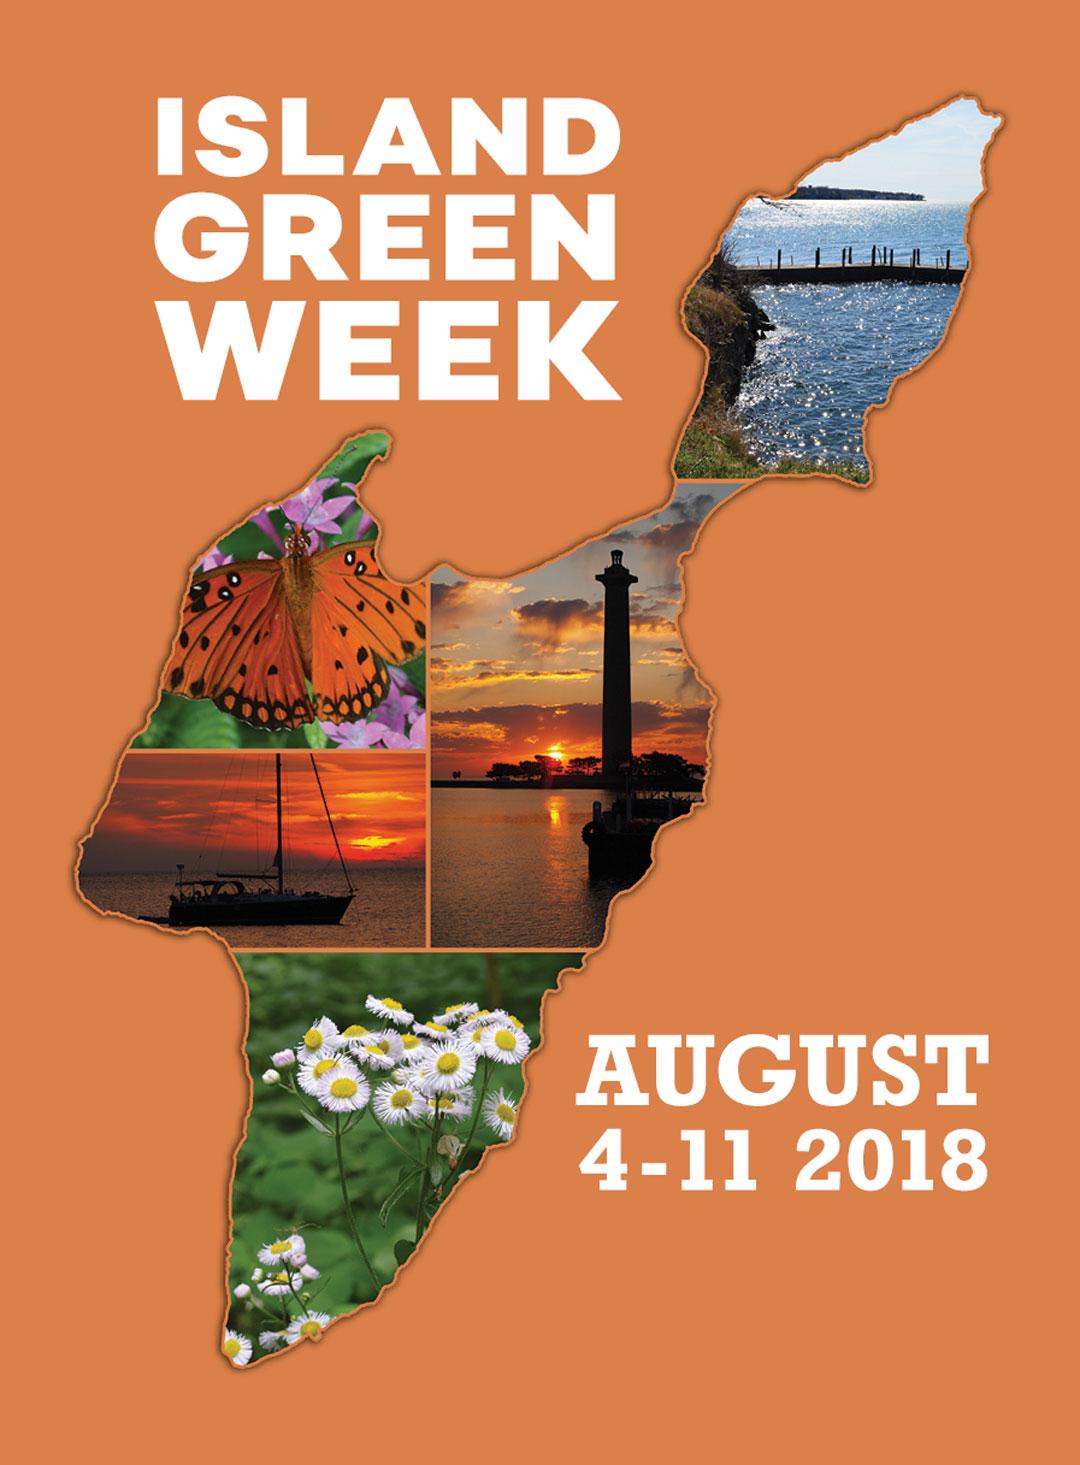 Island Green Week 2018